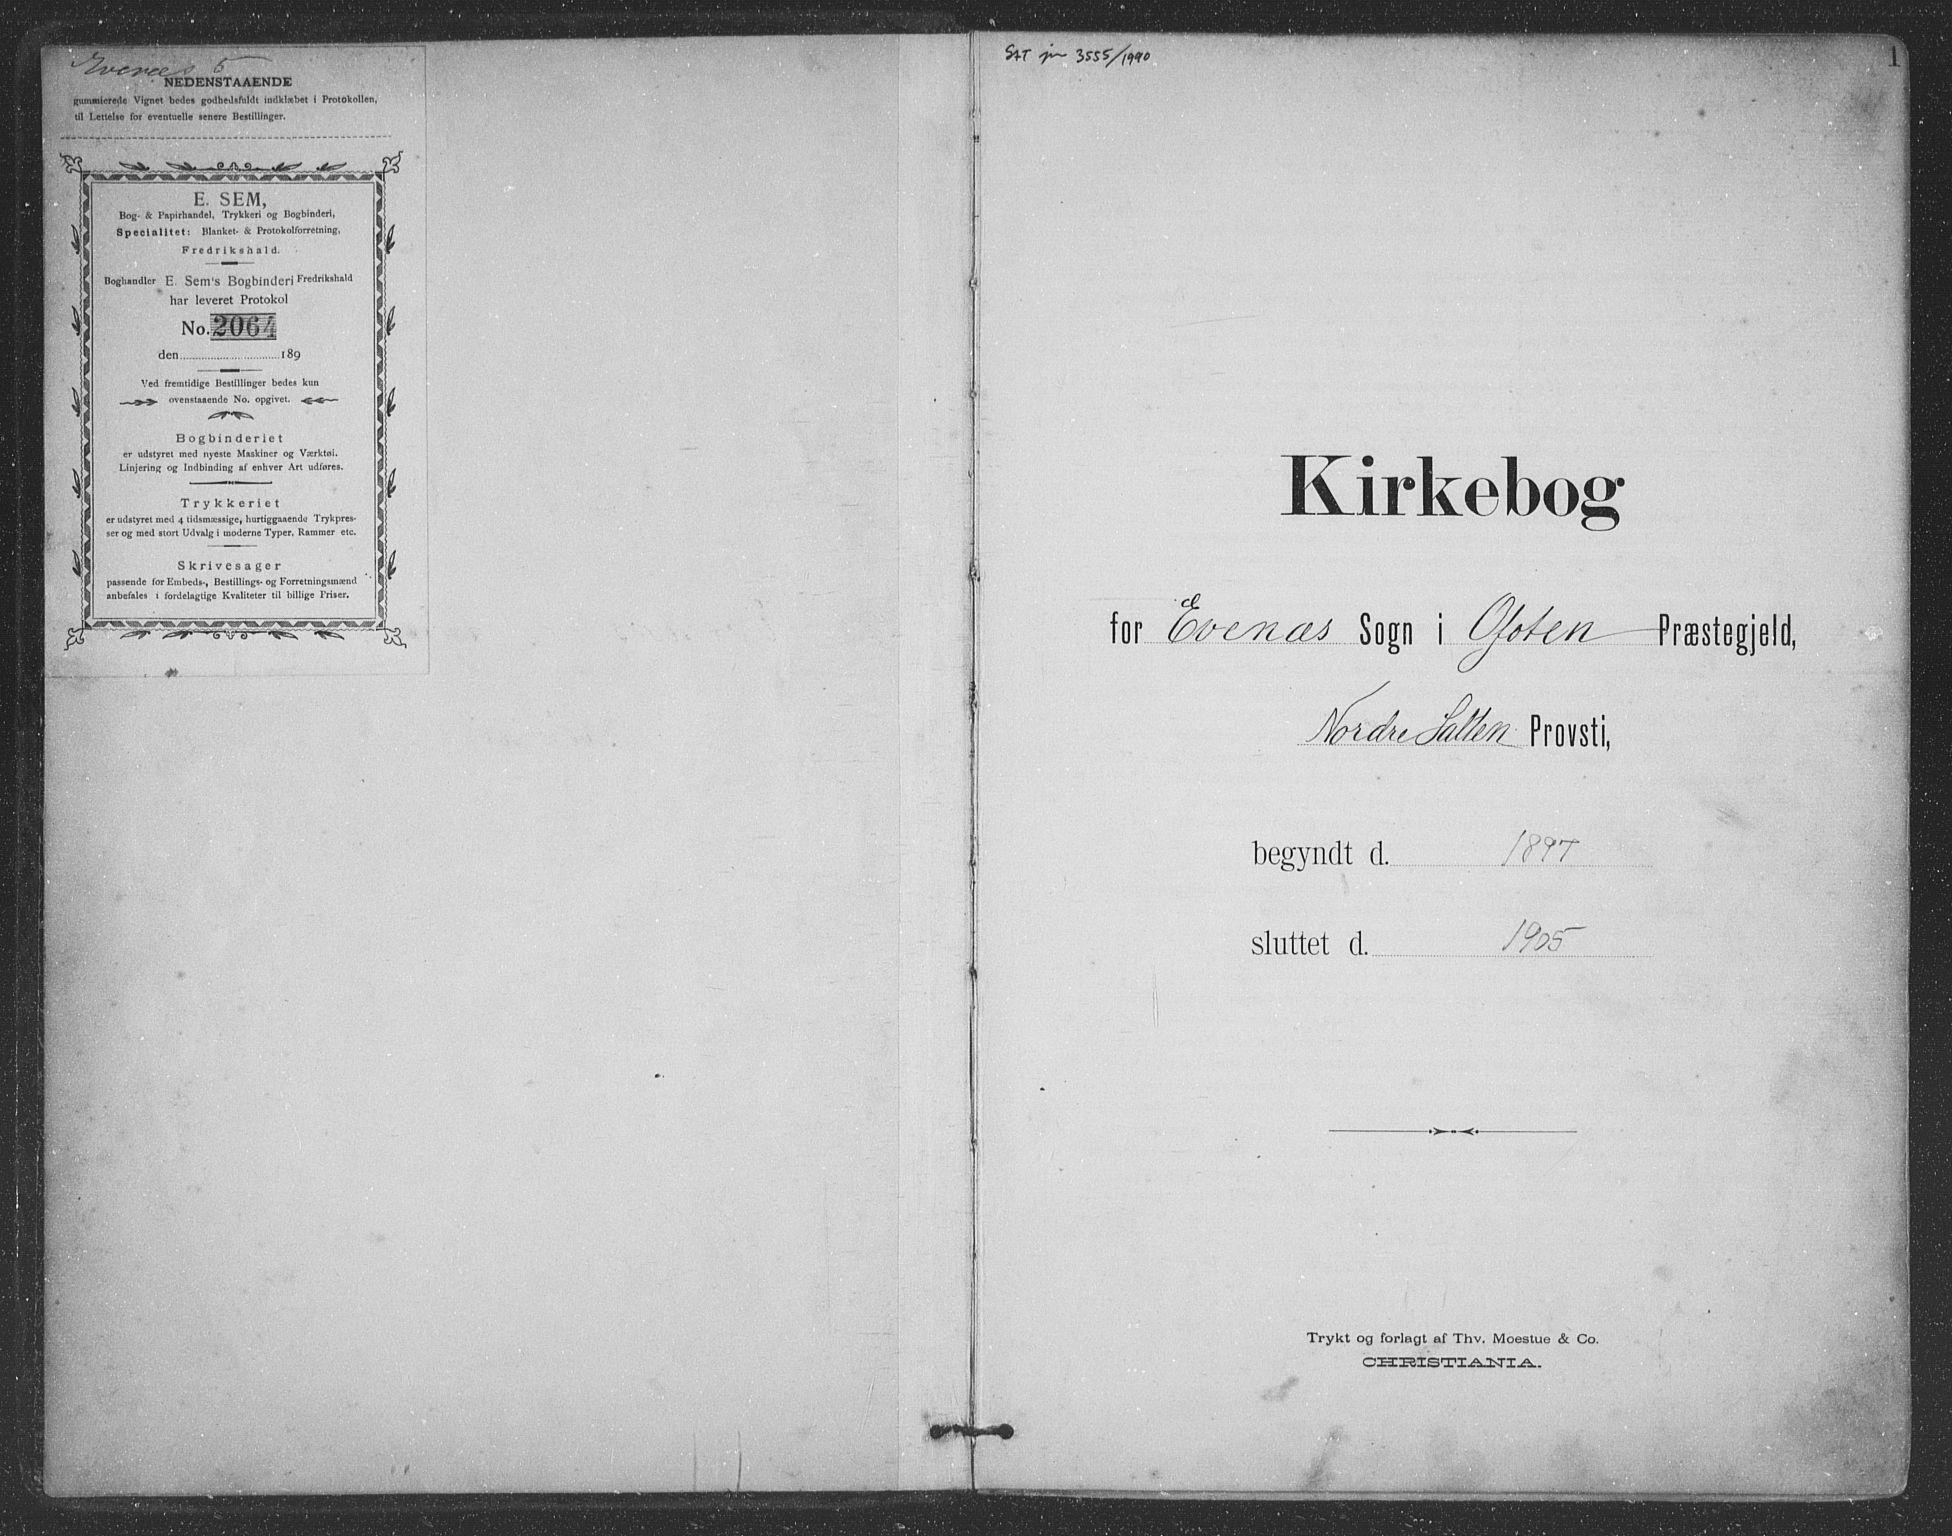 SAT, Ministerialprotokoller, klokkerbøker og fødselsregistre - Nordland, 863/L0899: Ministerialbok nr. 863A11, 1897-1906, s. 1